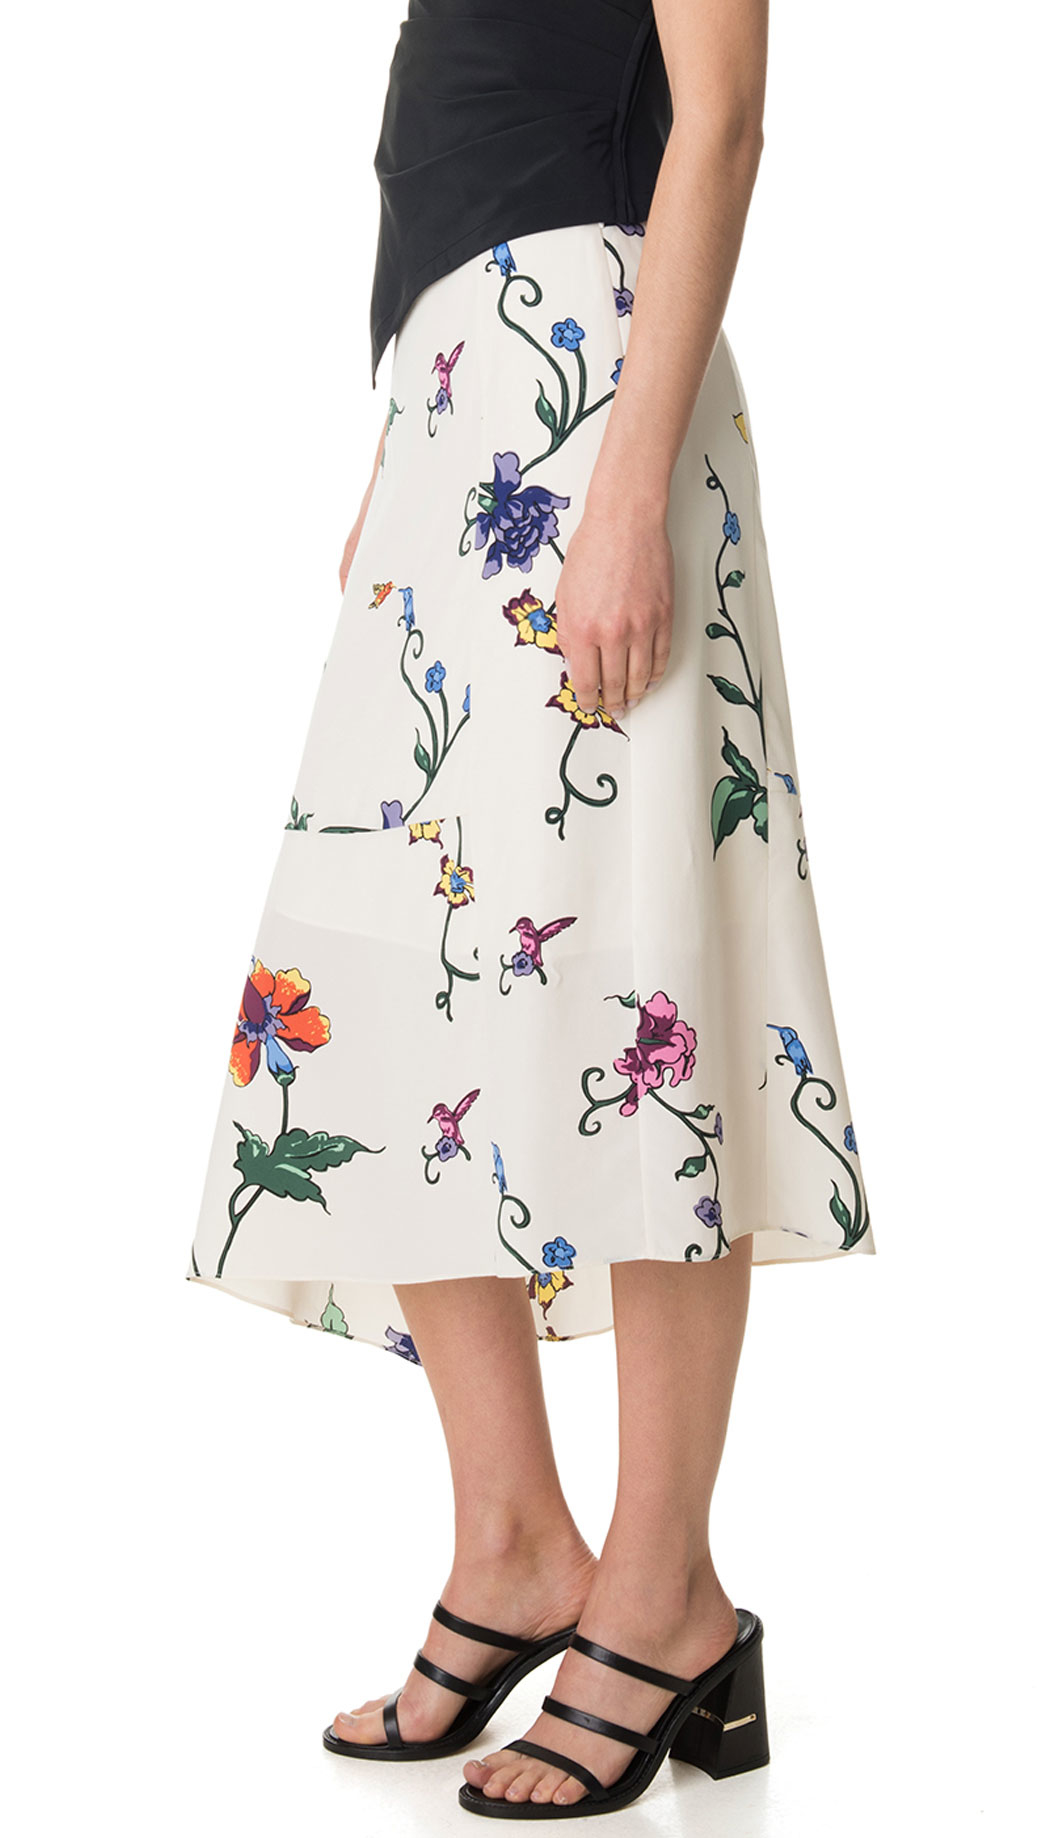 fcdd13a646 Tibi Bella Floral Asymmetrical Skirt - Lyst